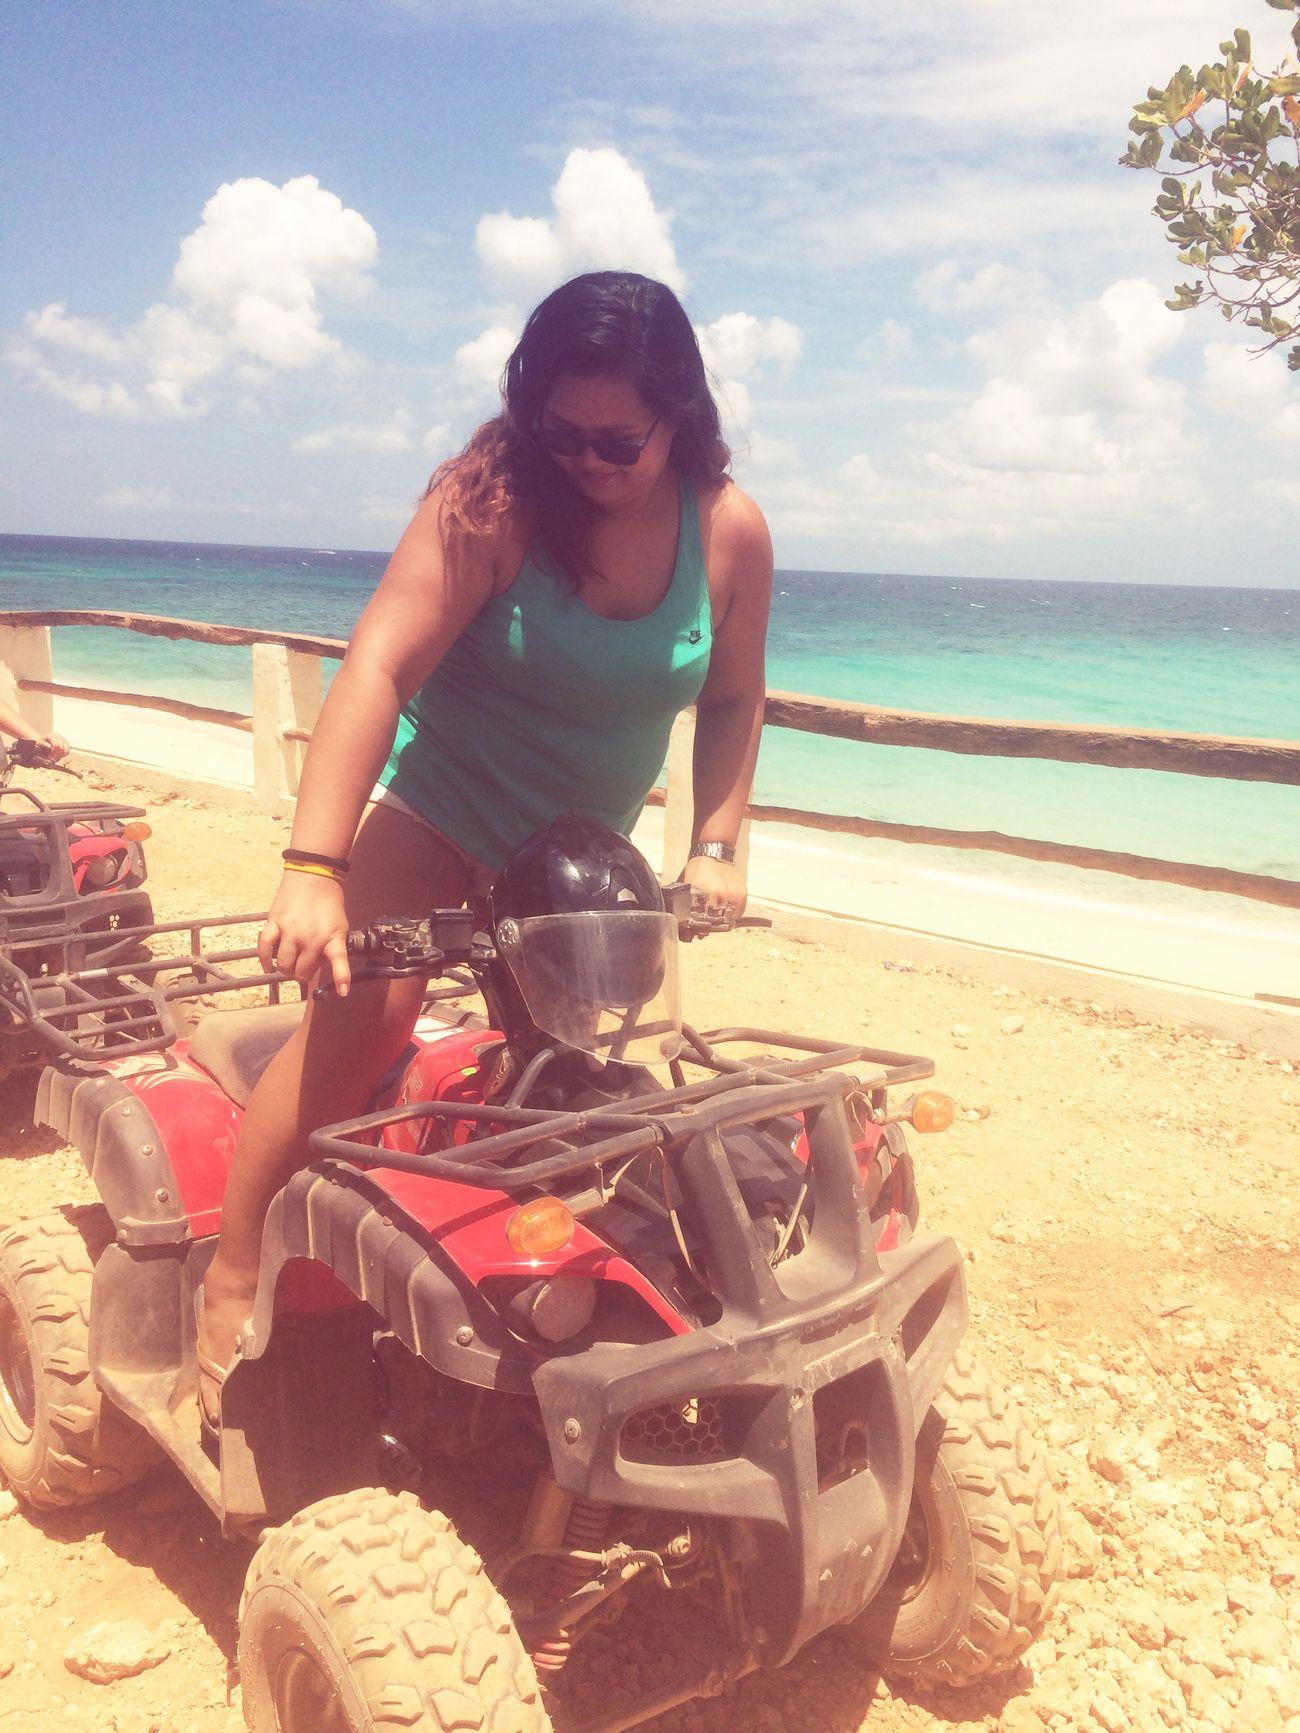 MeinAutomoment Enjoying Life Feel Feel The Journey Atv Beach Boracay Summer